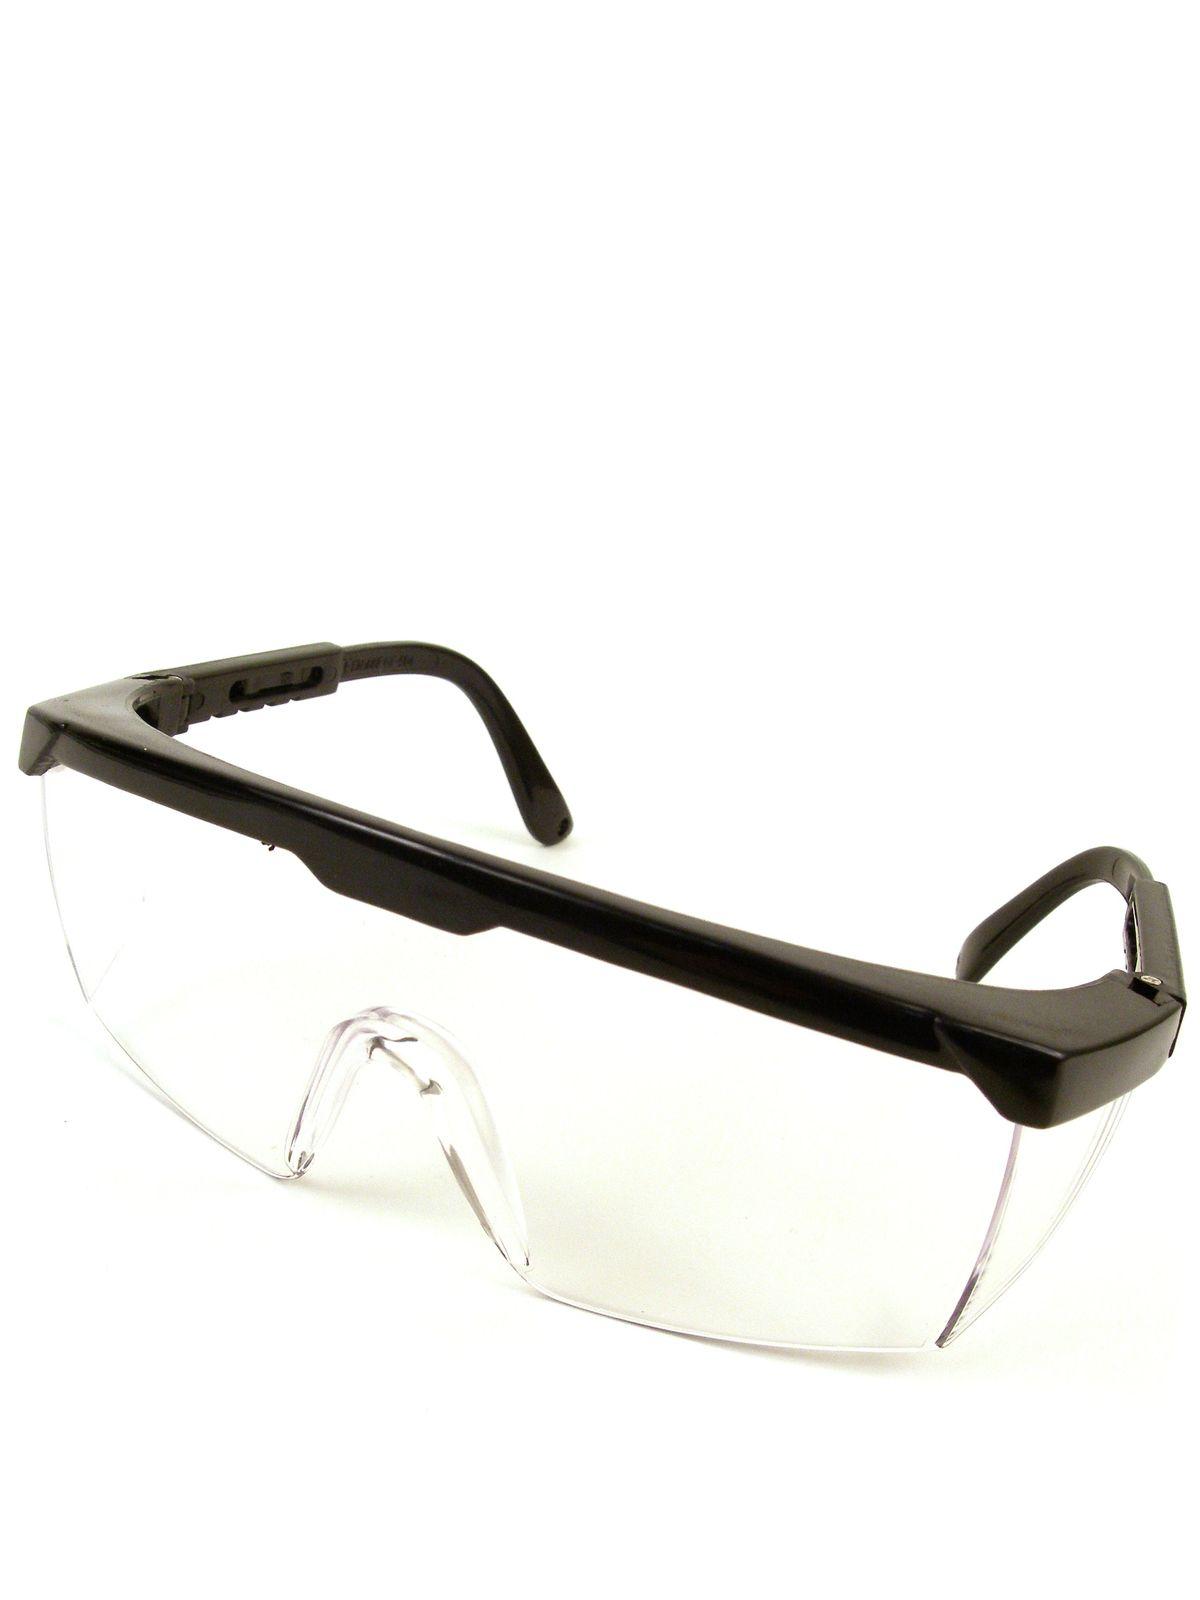 Diamond Tech - Fireworks Clear Safety Glasses